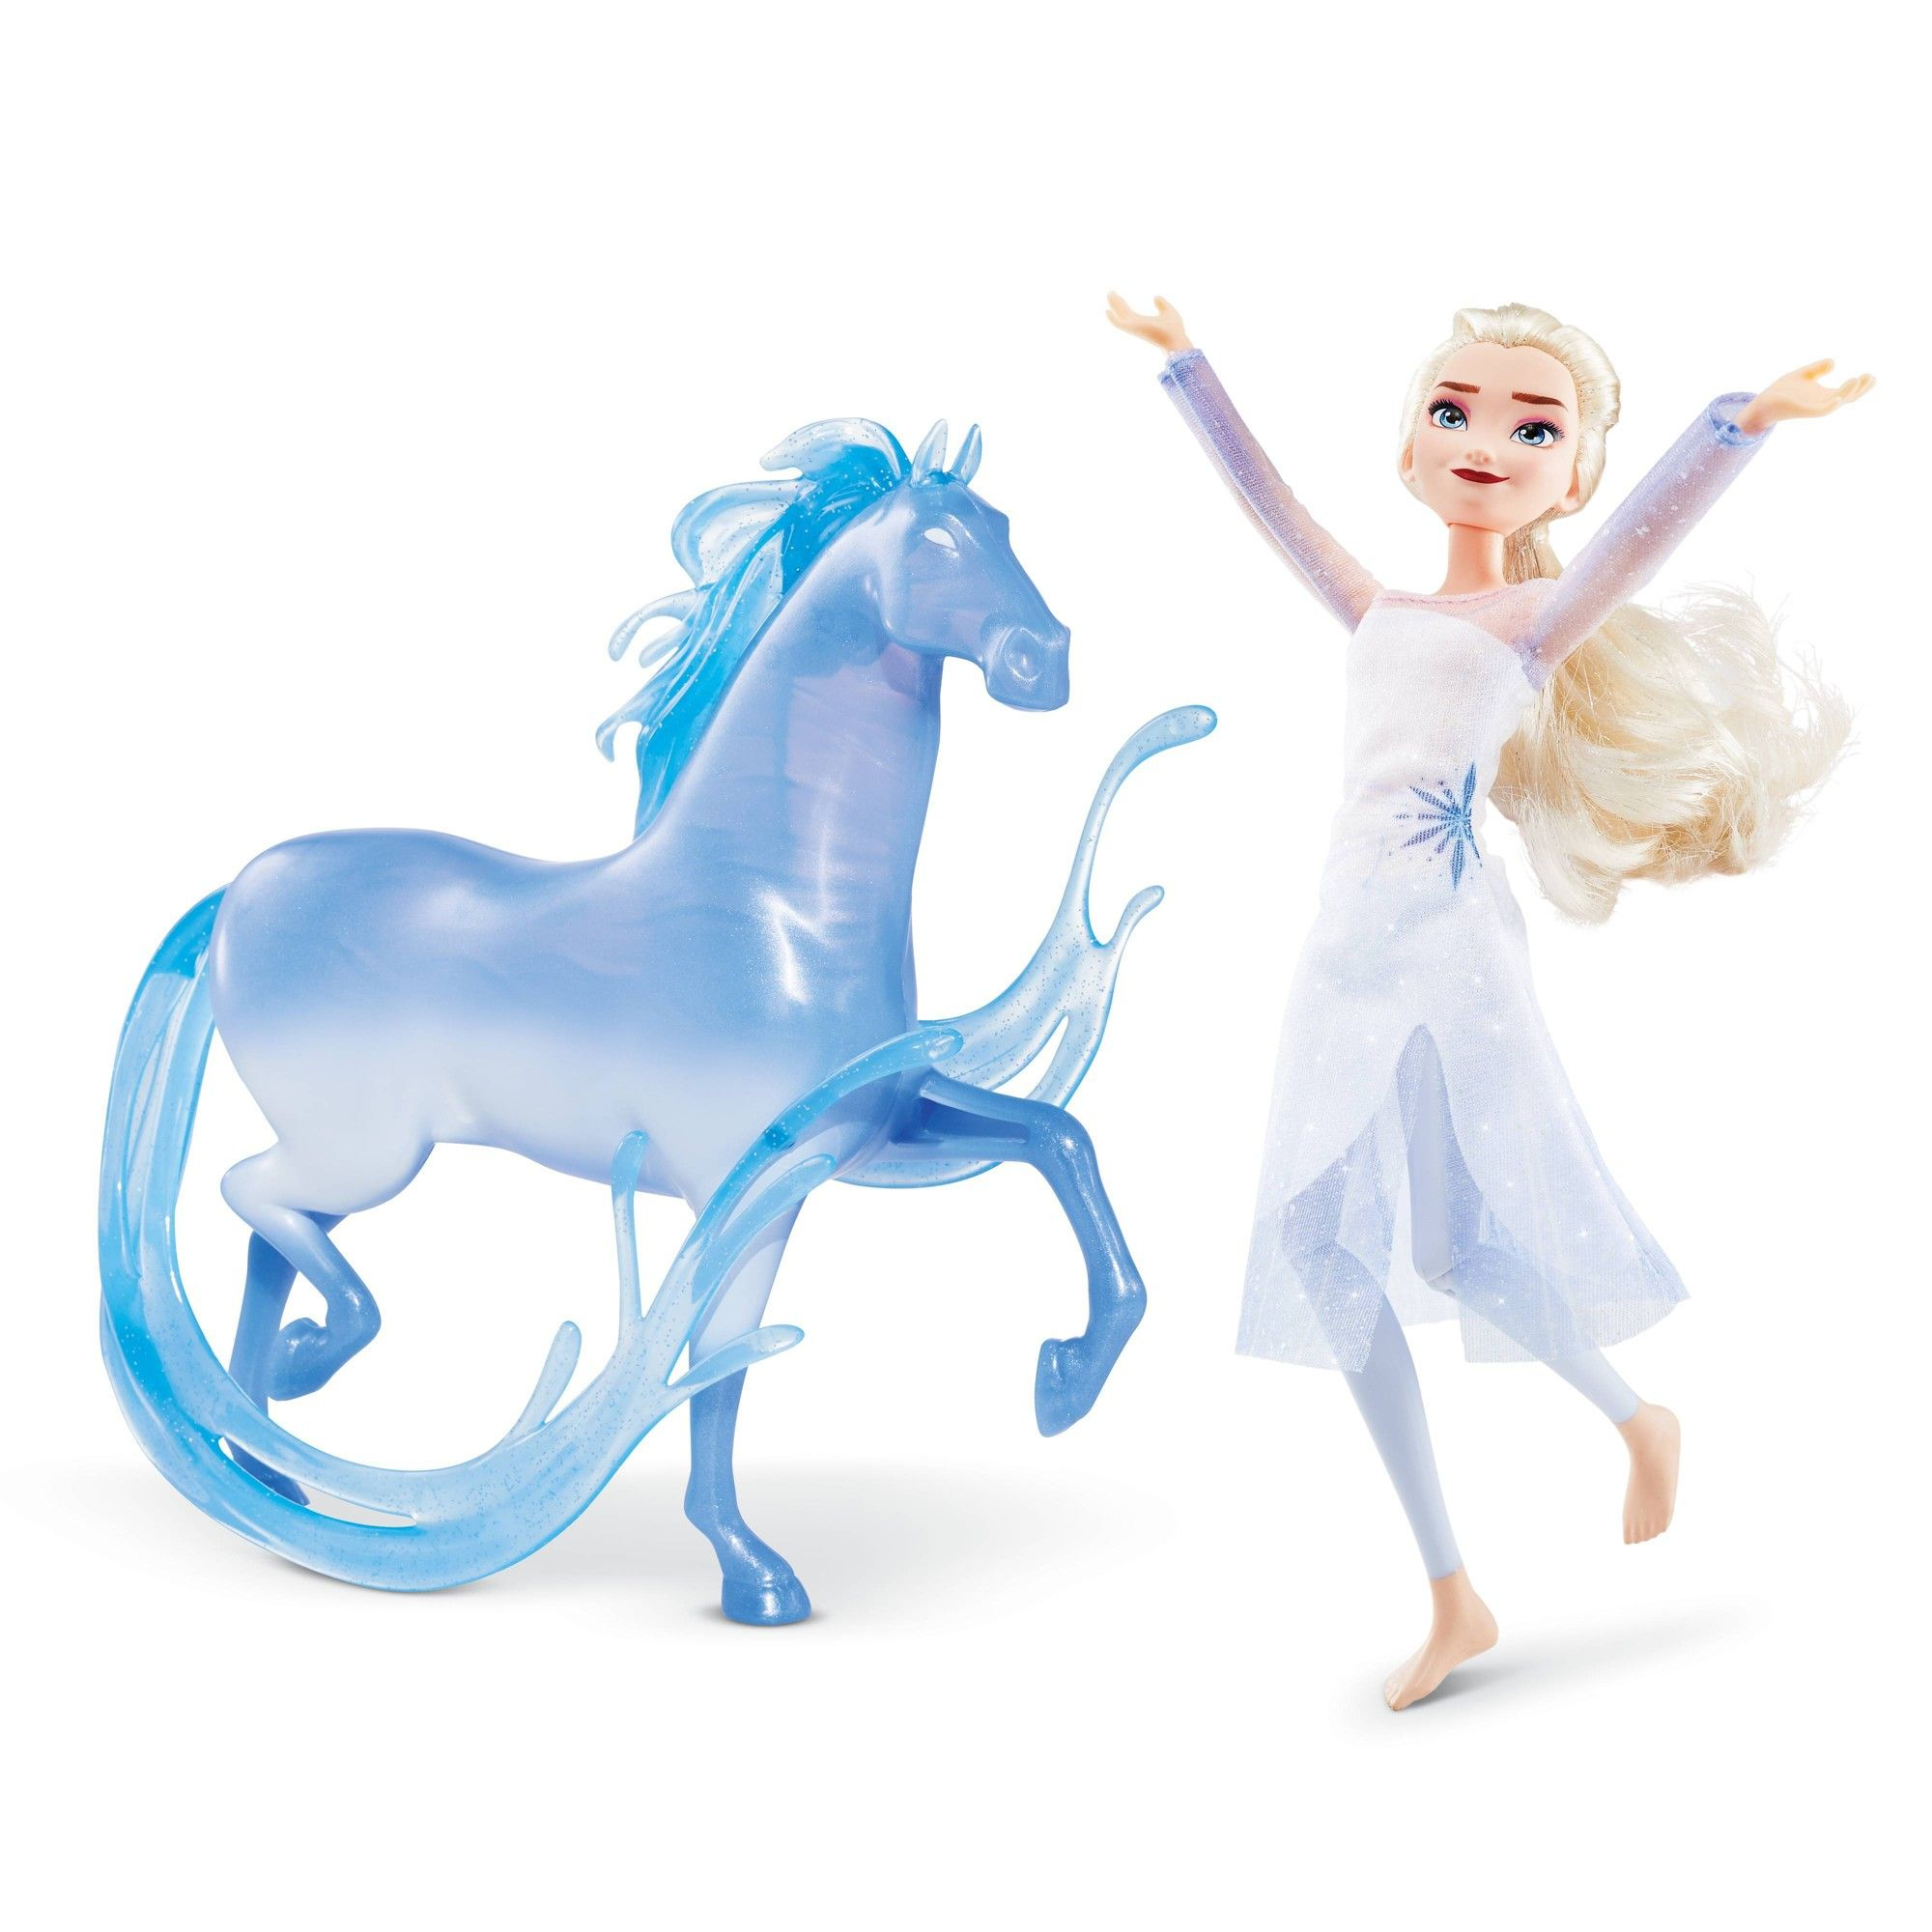 Disney Frozen 2 Elsa Fashion Doll And Nokk Figure Disney Frozen Toys Frozen Toys Disney Frozen